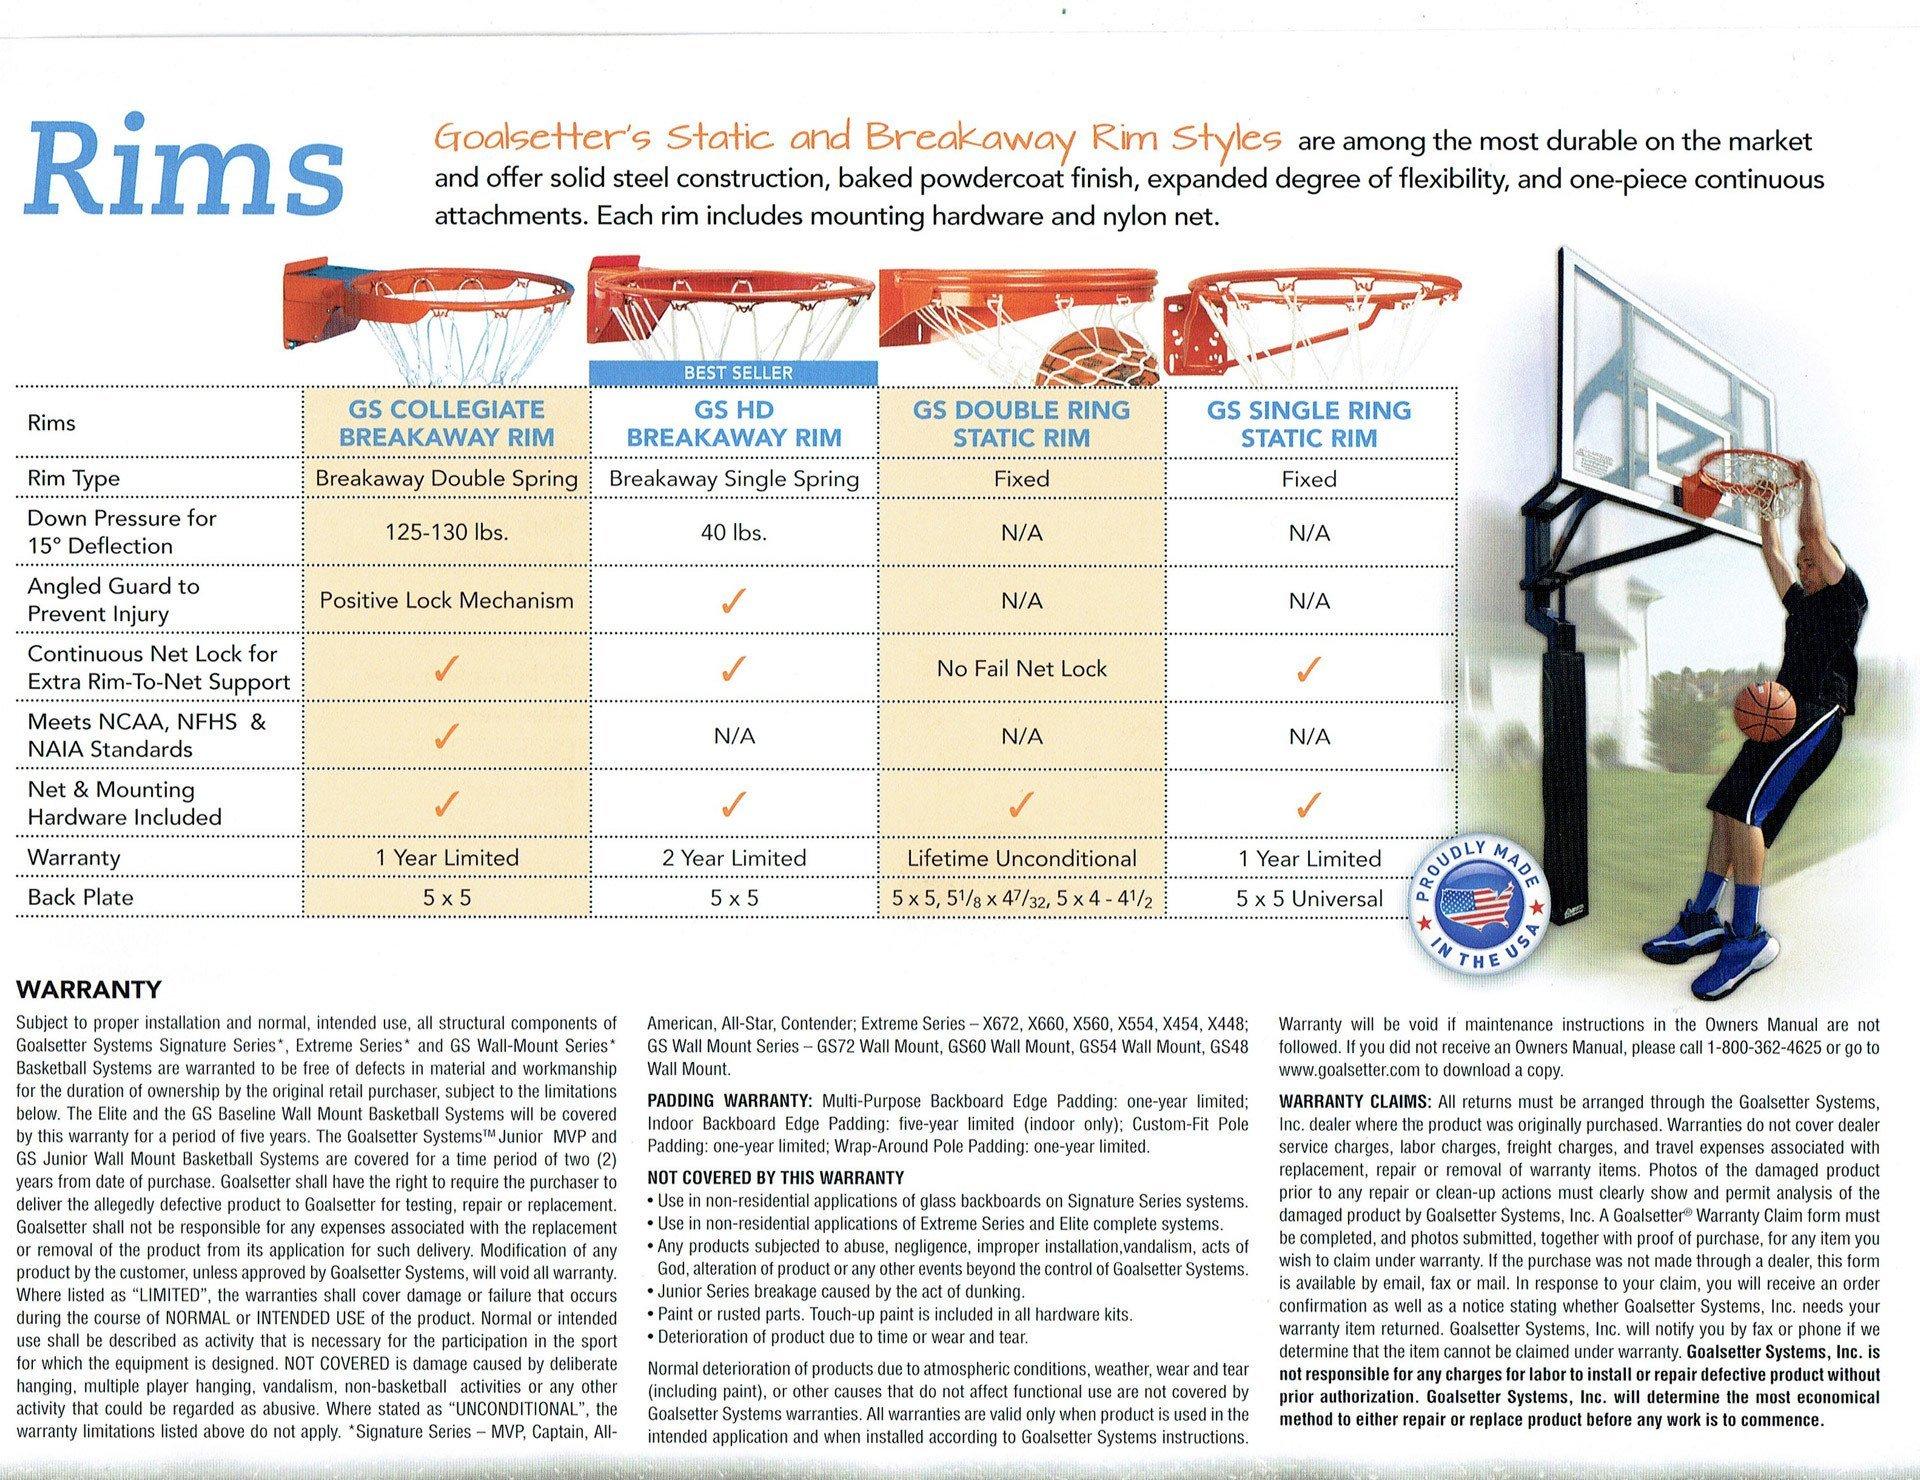 goalsetter basketball systems, rims - Wood Kingdom East - Coram, Long Island, Medford, The Hamptons